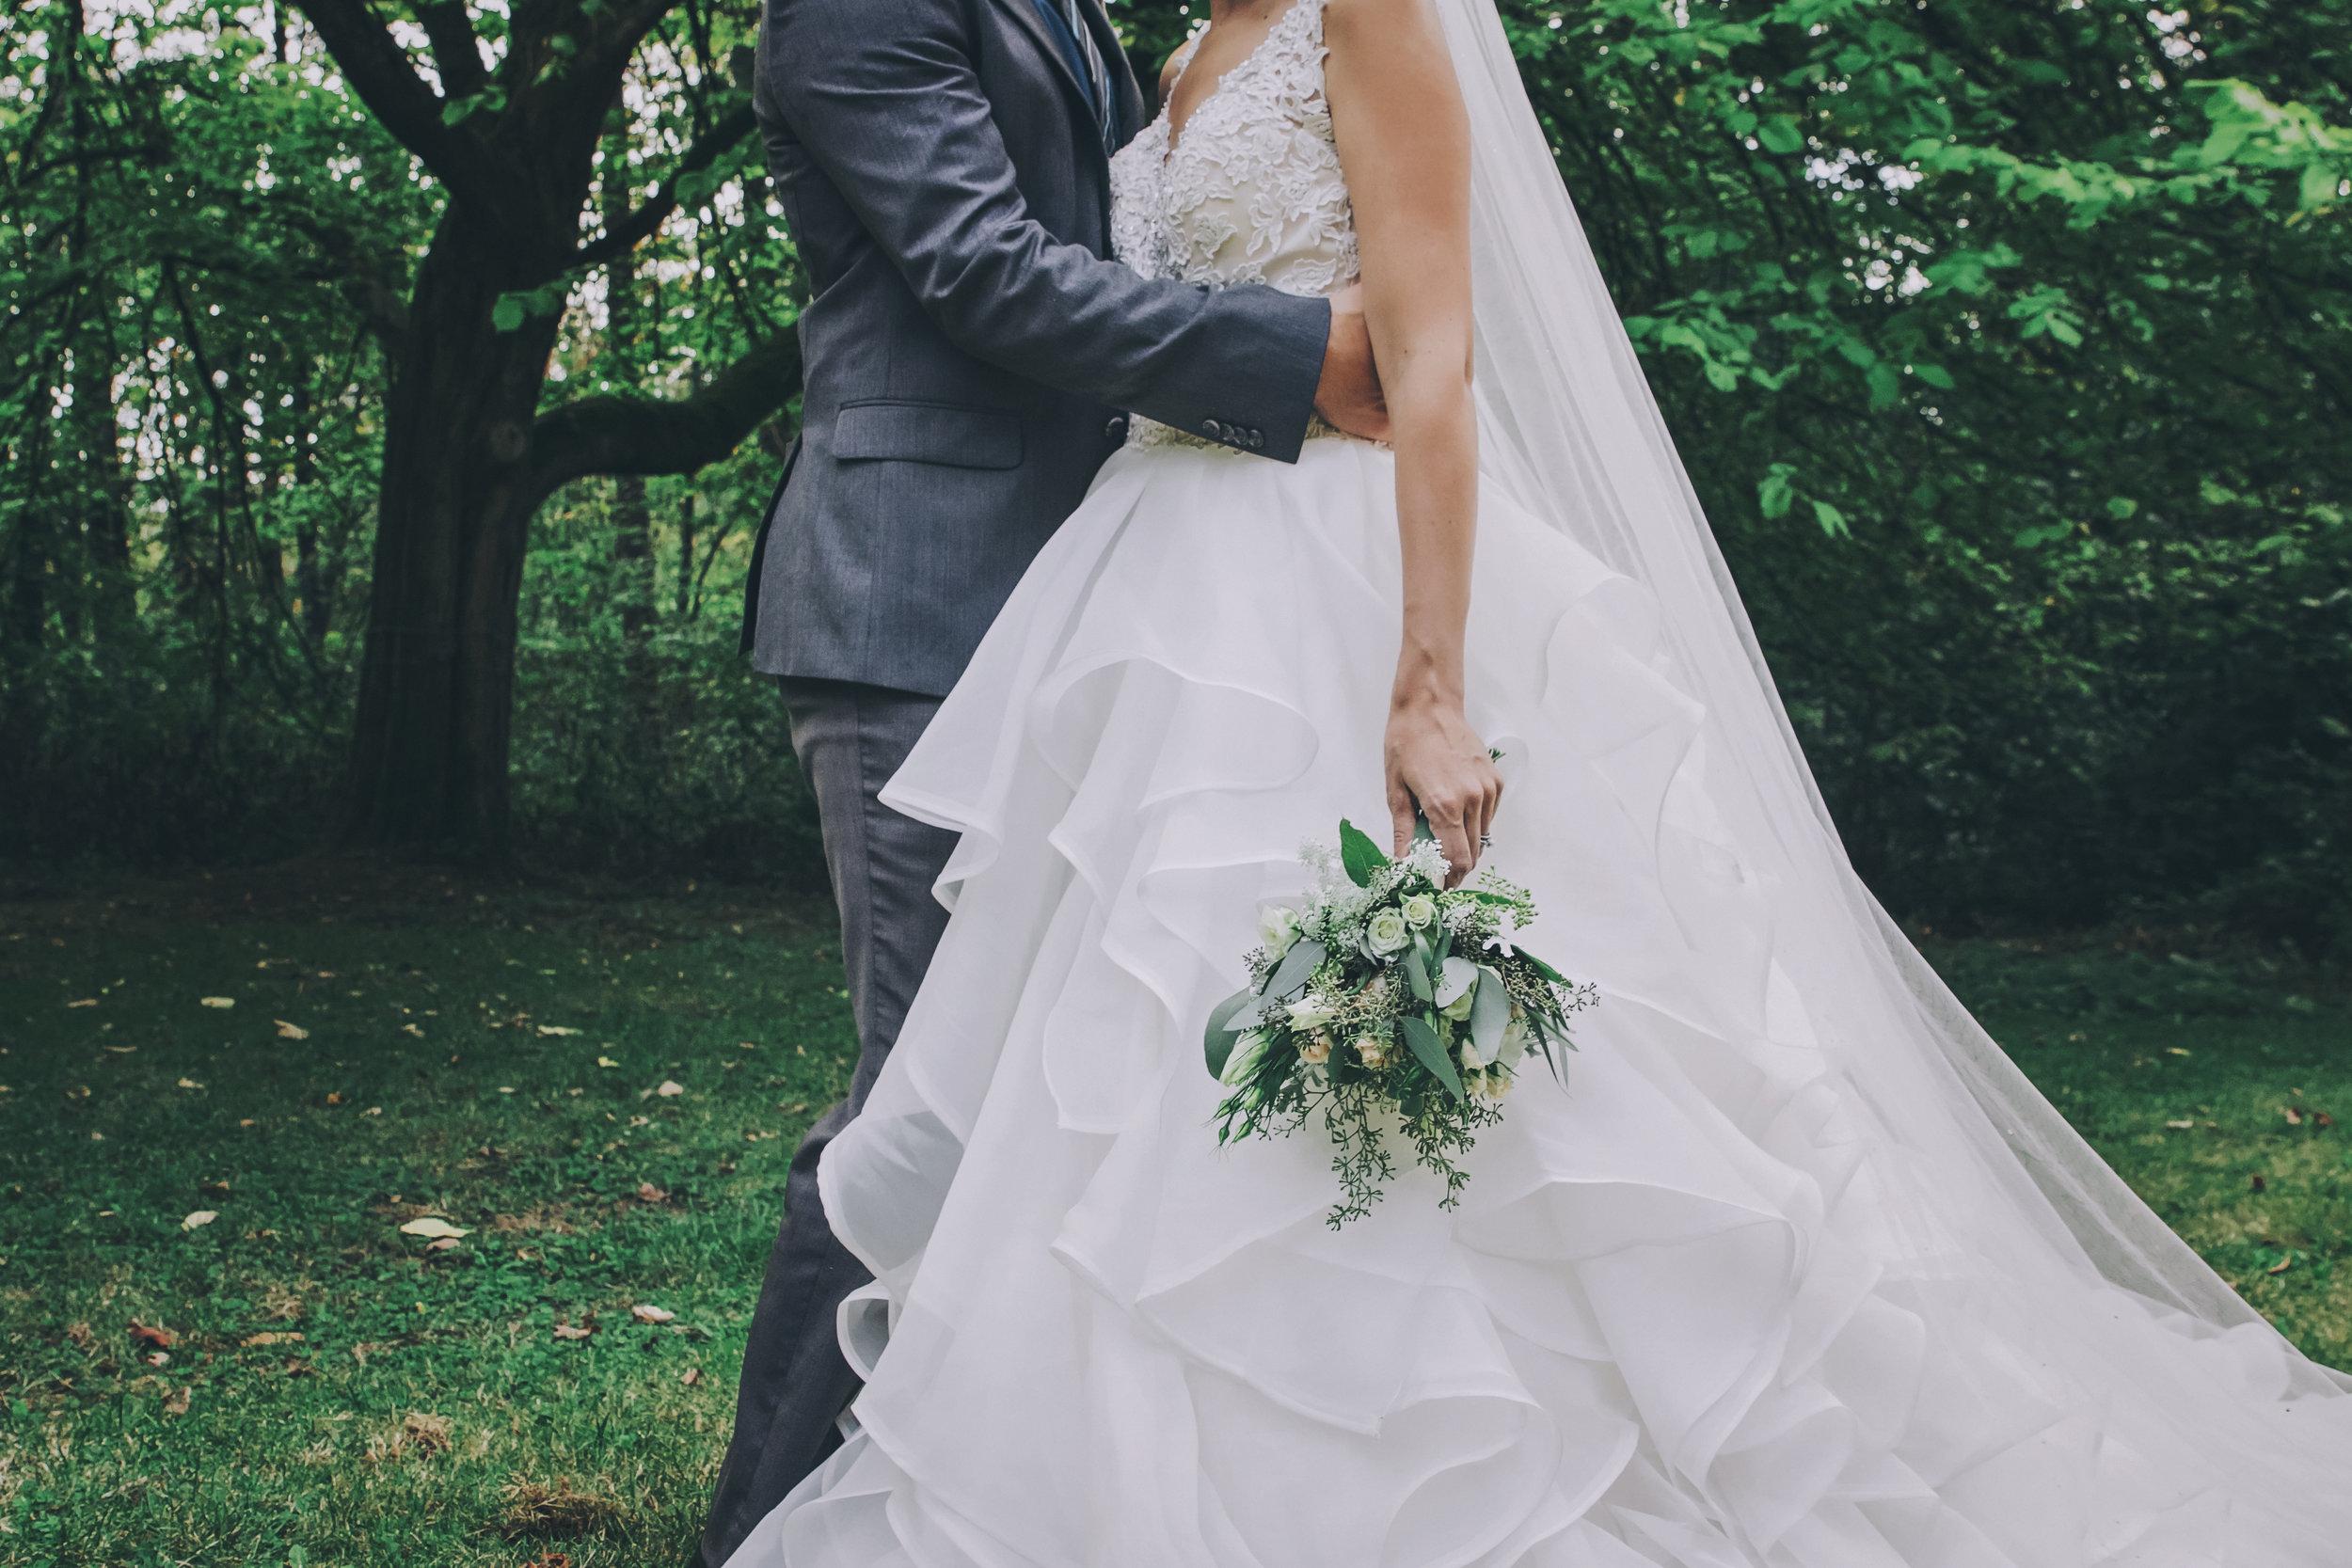 #woodland #wedding #whimsical #ballgown #connection #emotional #fairytale #princess #bride #groom #greywedding #etherealwedding #fairytalewedding #cathedralveil #veil